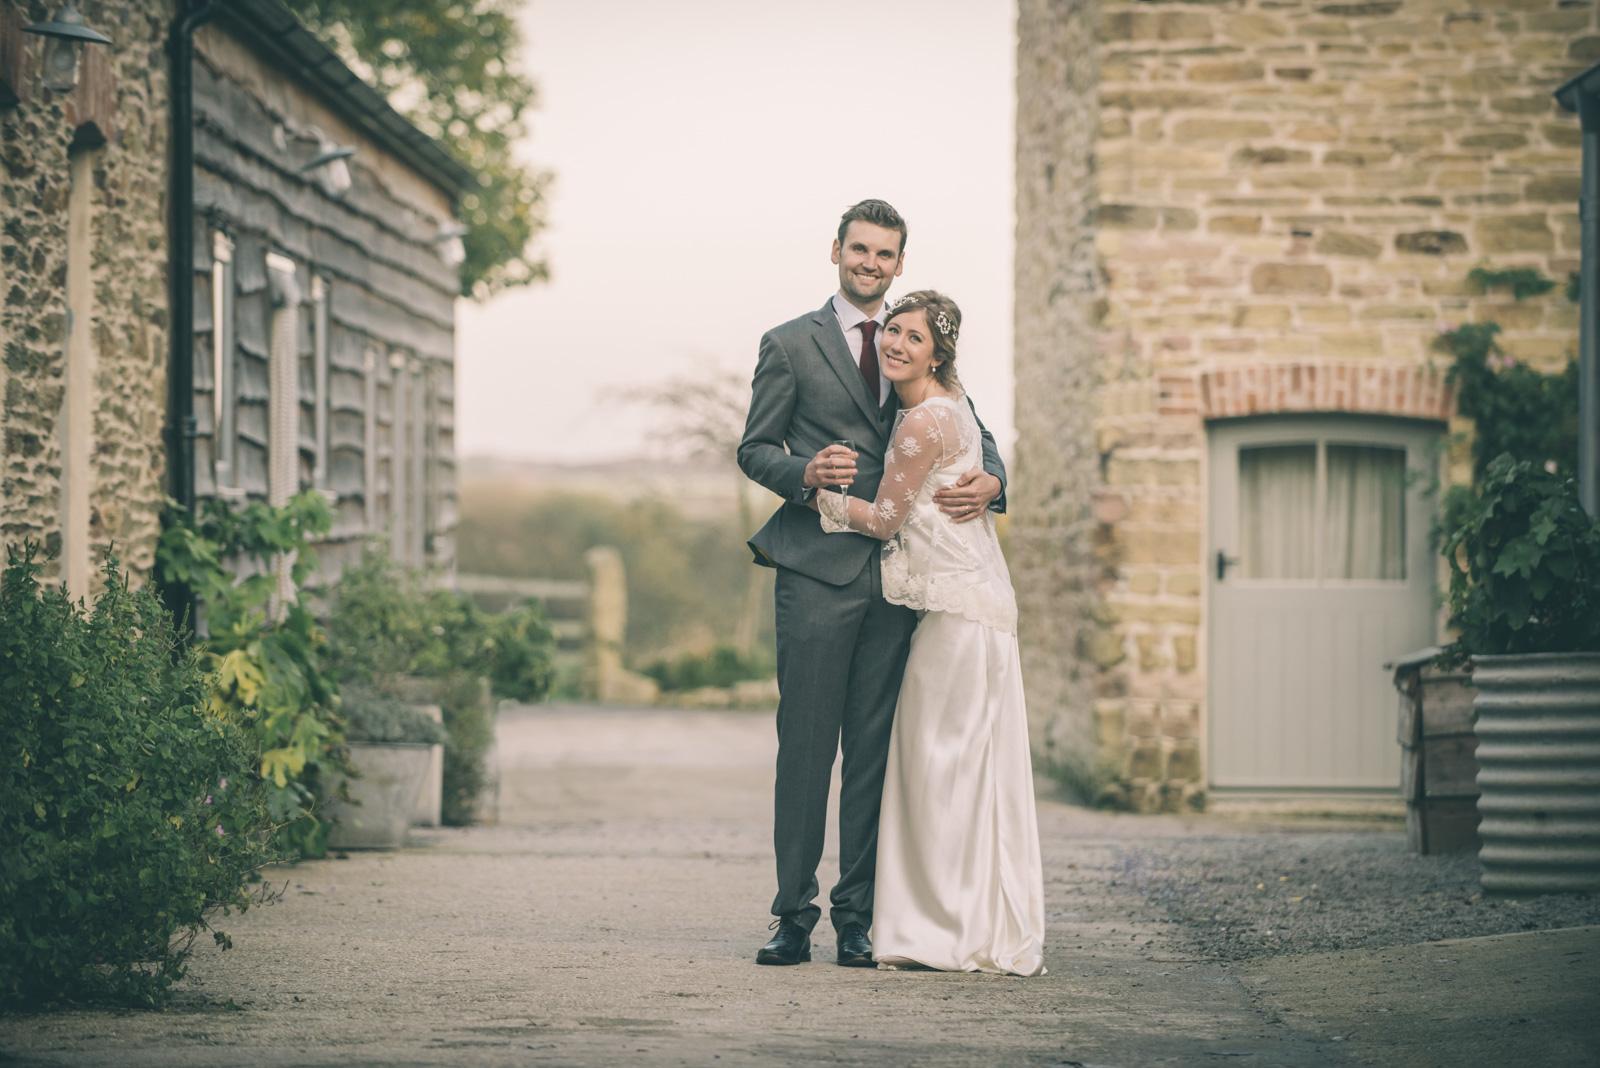 nancarrow-wedding-photography-117.jpg